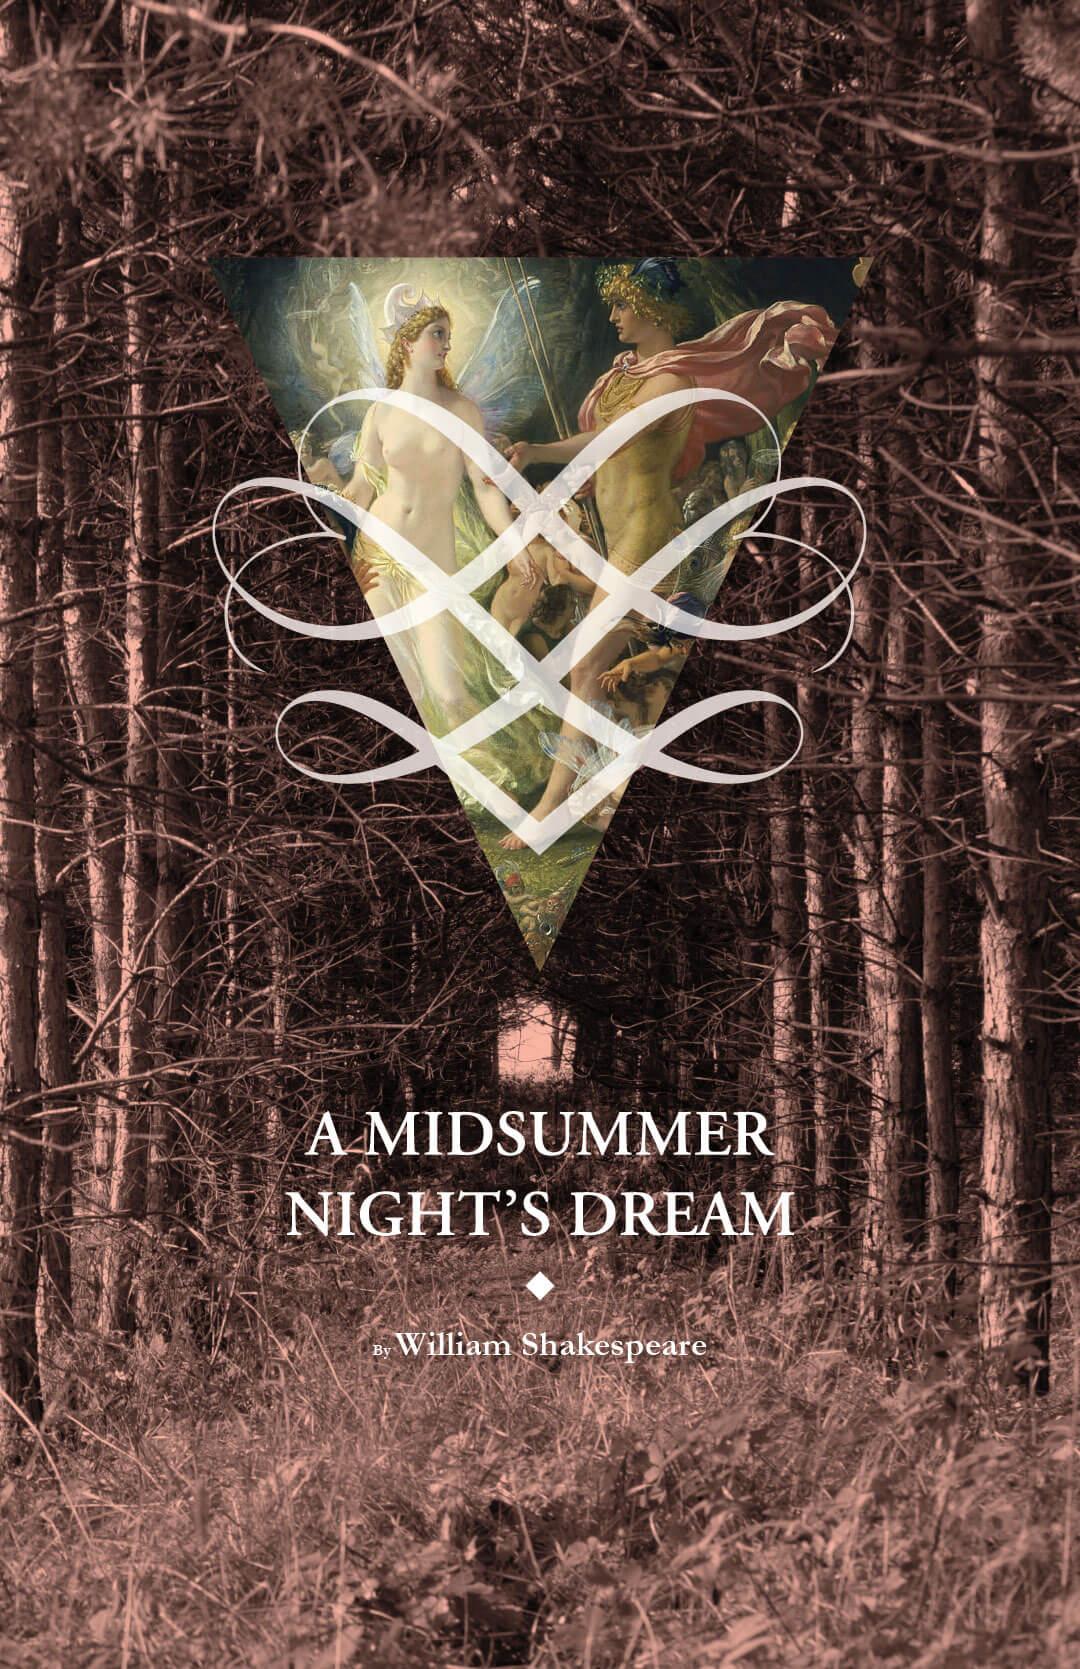 Virginia Tech School of Performing Arts show poster - A Midsummer Night's Dream